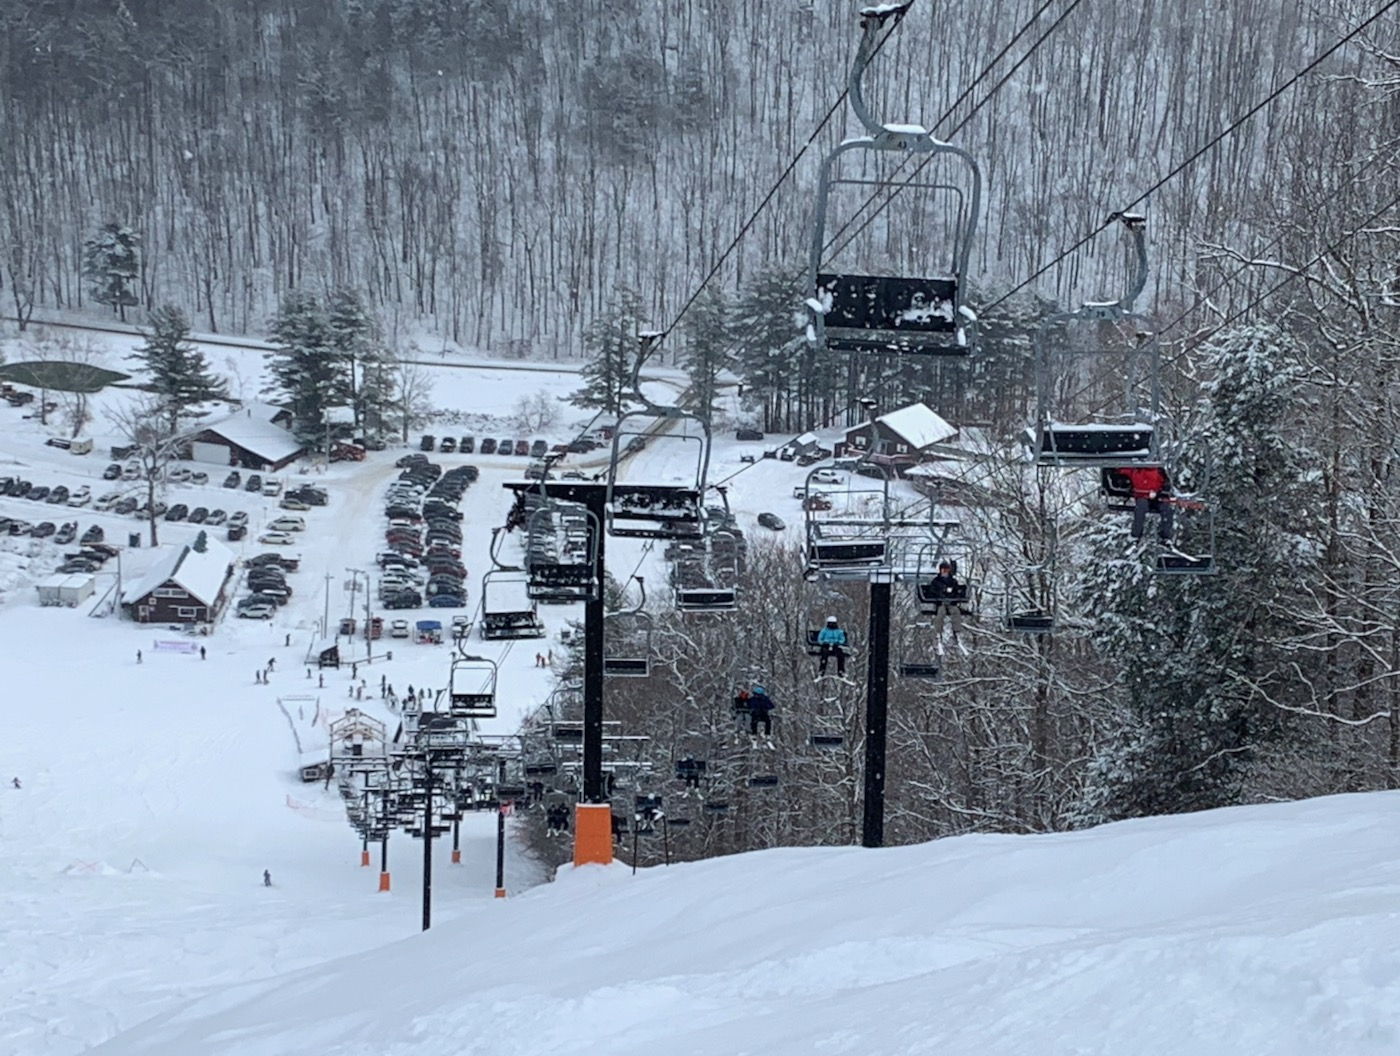 Willard steeps